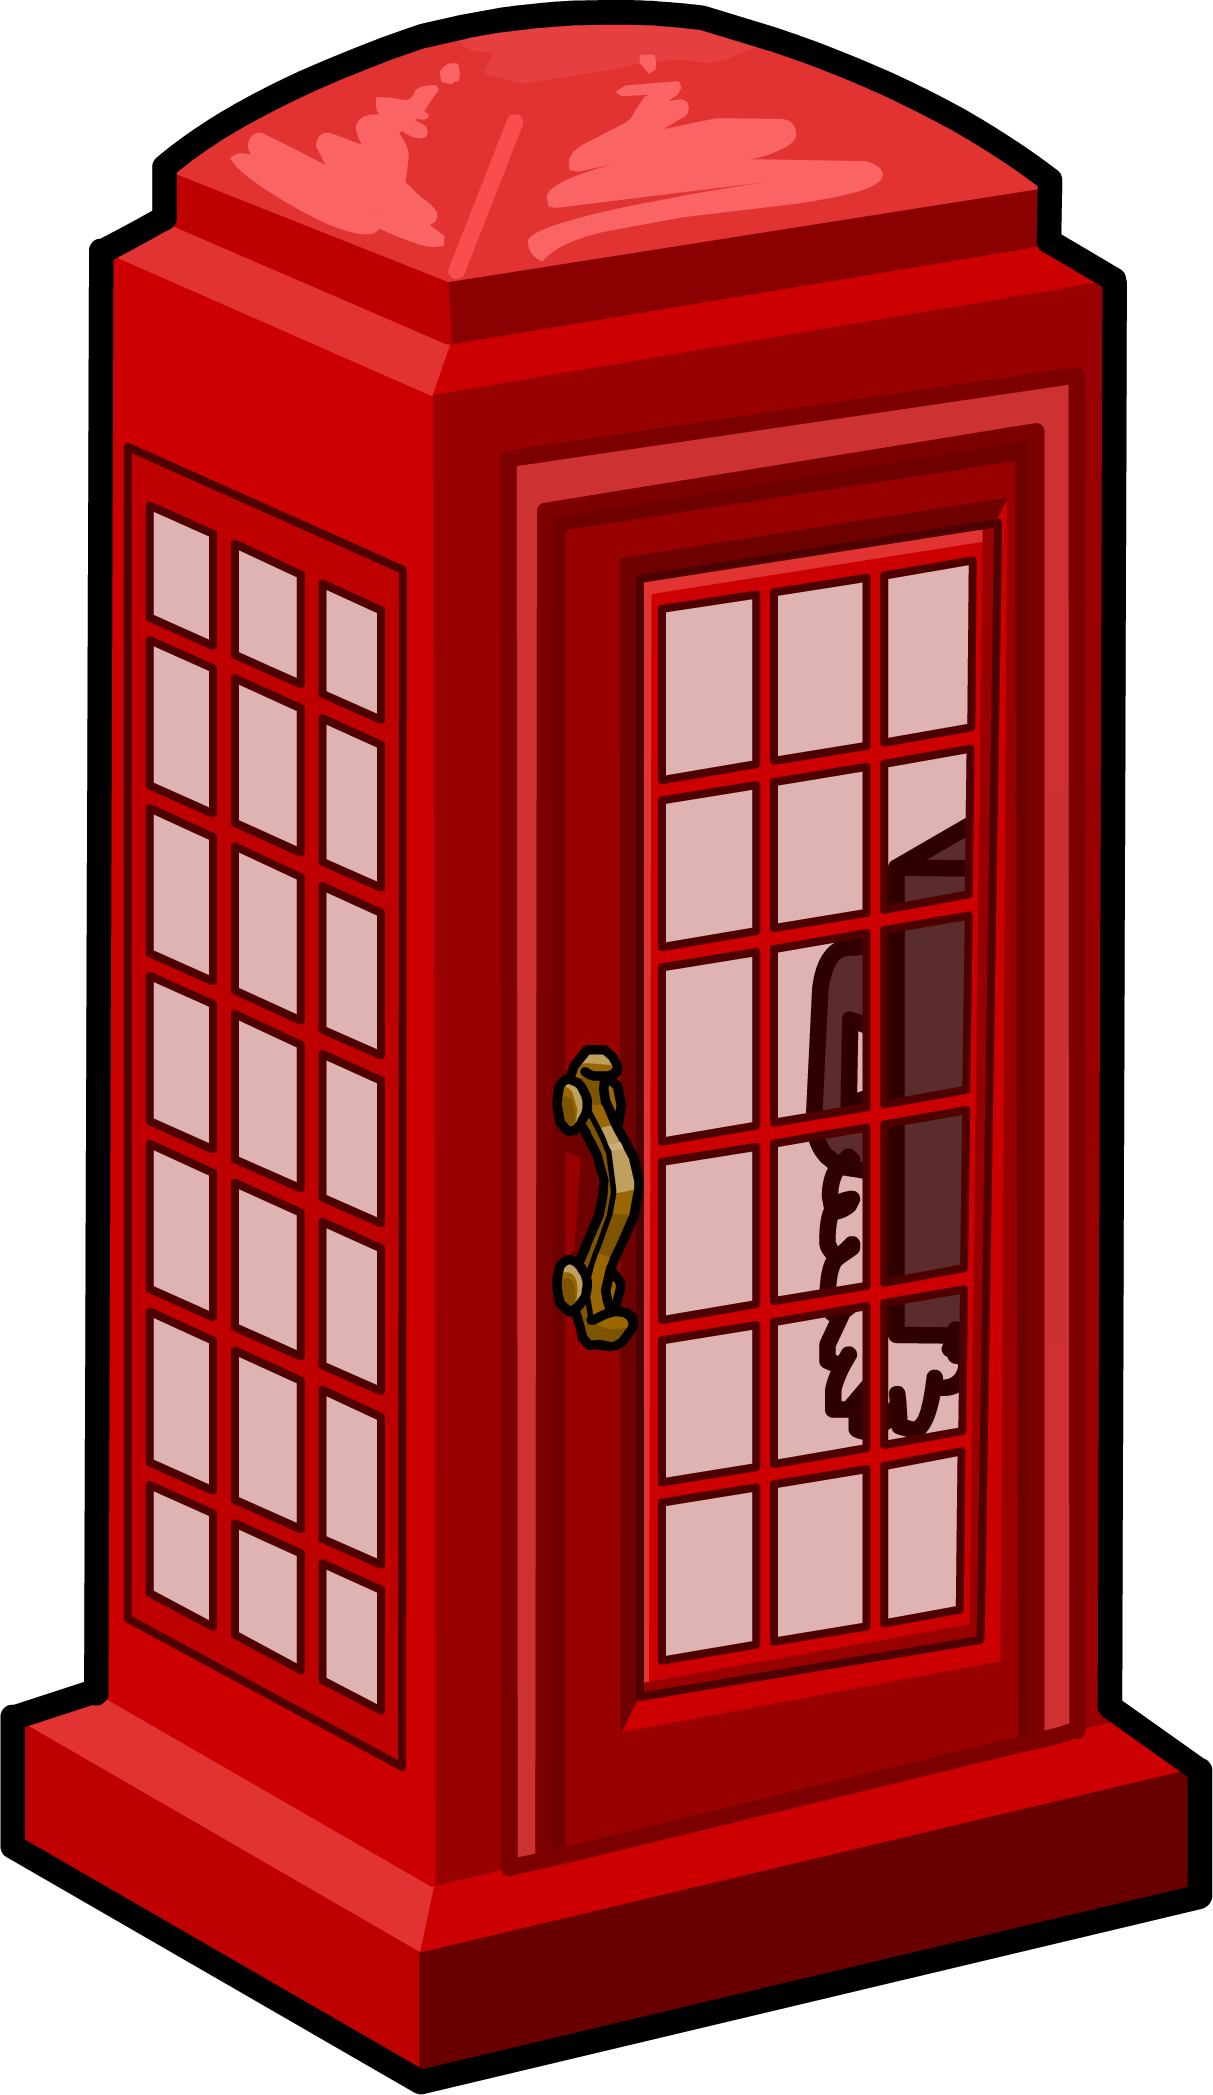 Telephone Booth clipart telephone box Wikia Telephone by Telephone Club